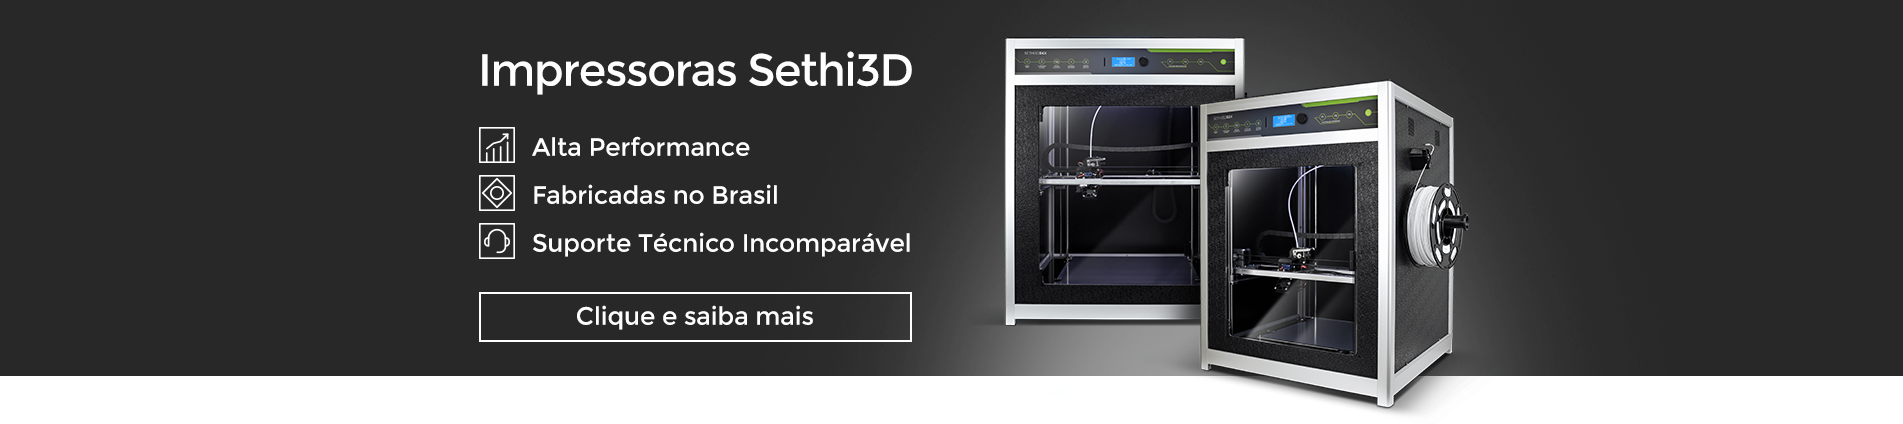 Impressoras Sethi3D 2021